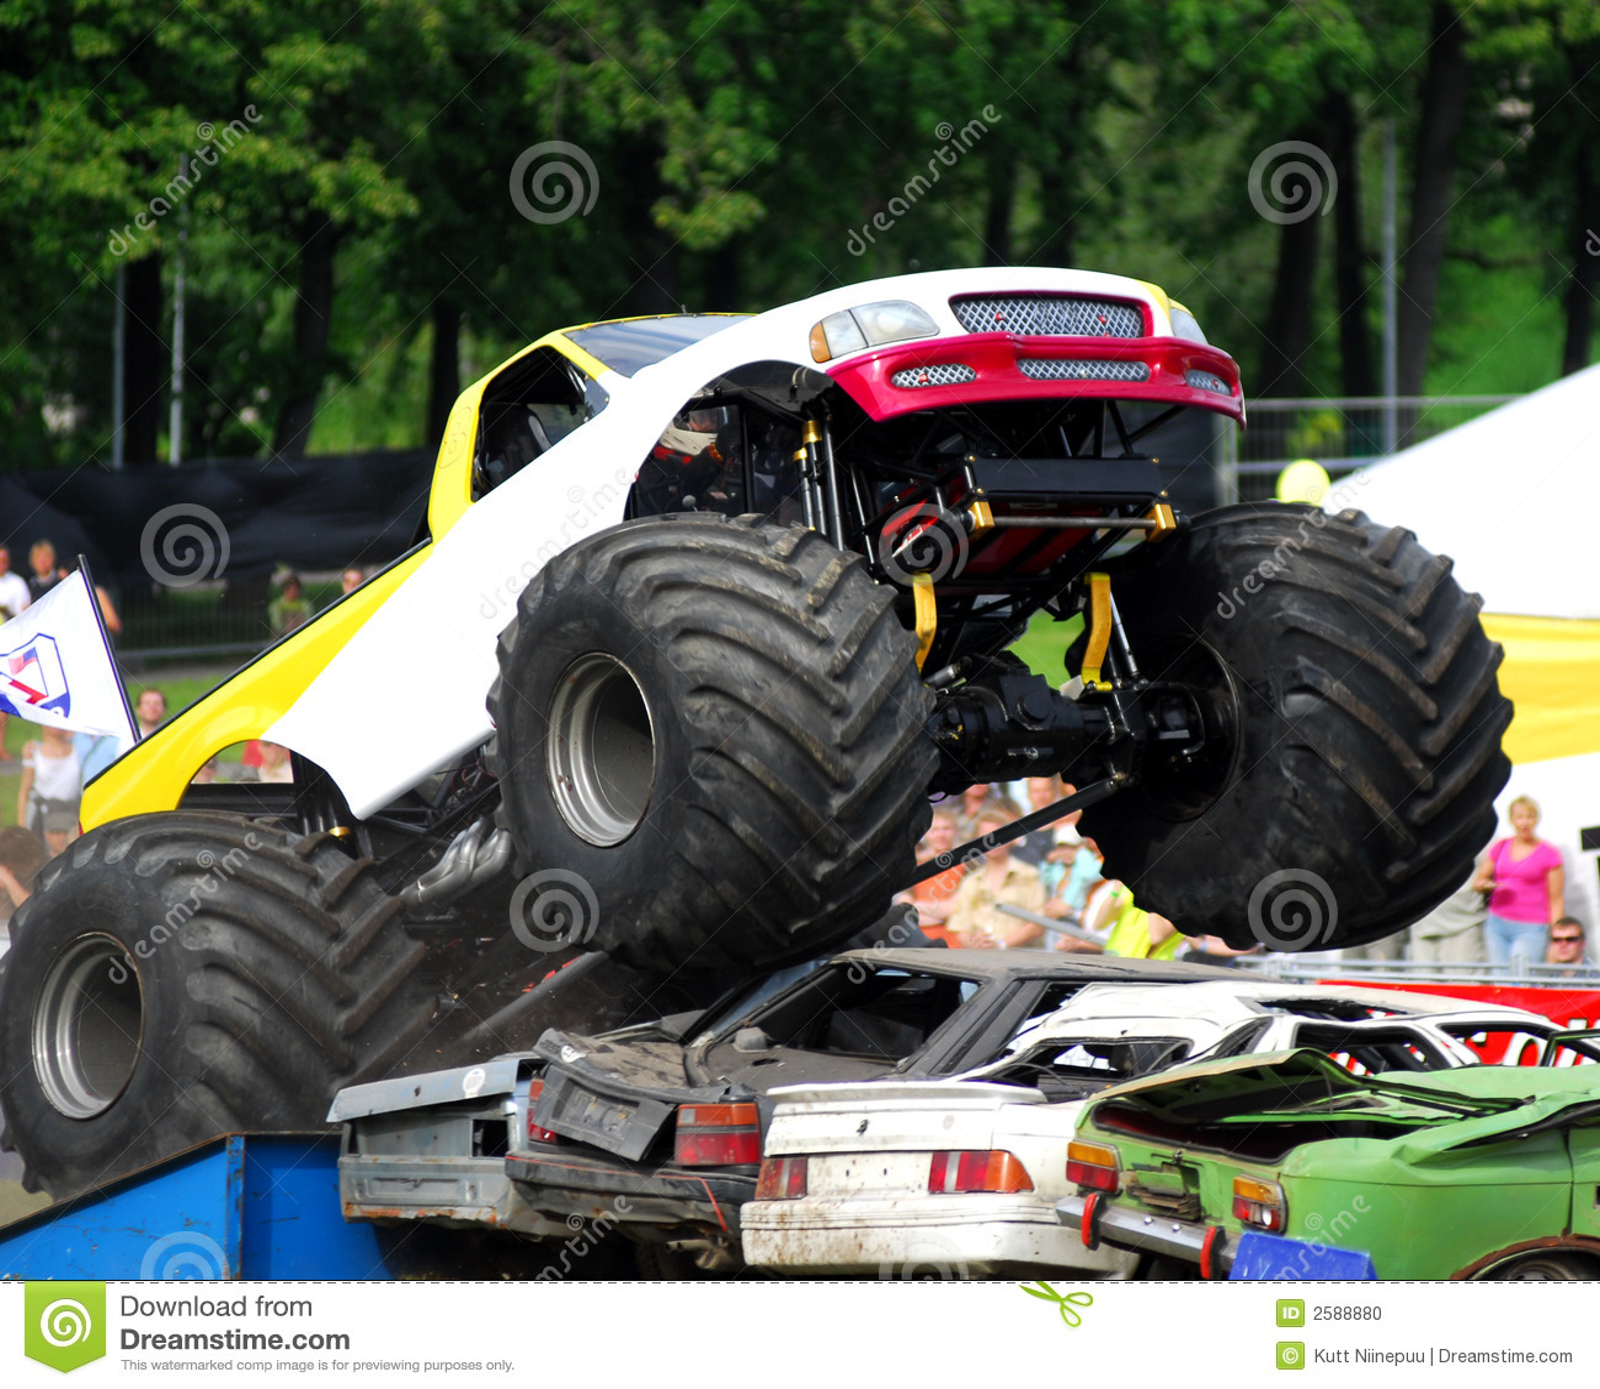 Monster Truck Jumping Wrecks Stock Photo